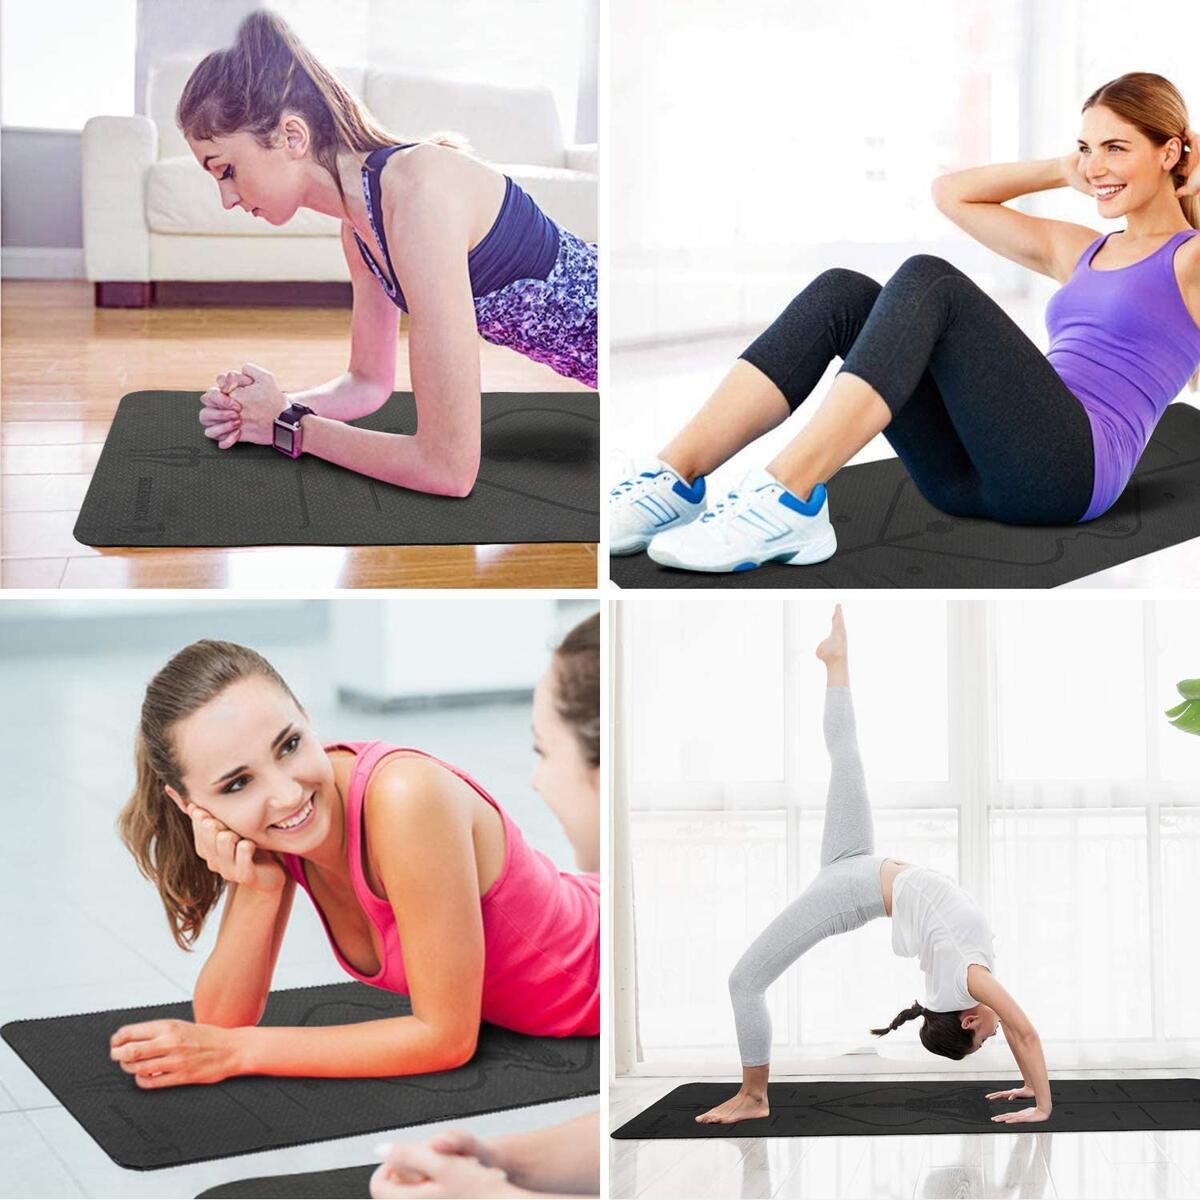 Nononfish Premium EcoFriendly TPE yoga mat 72